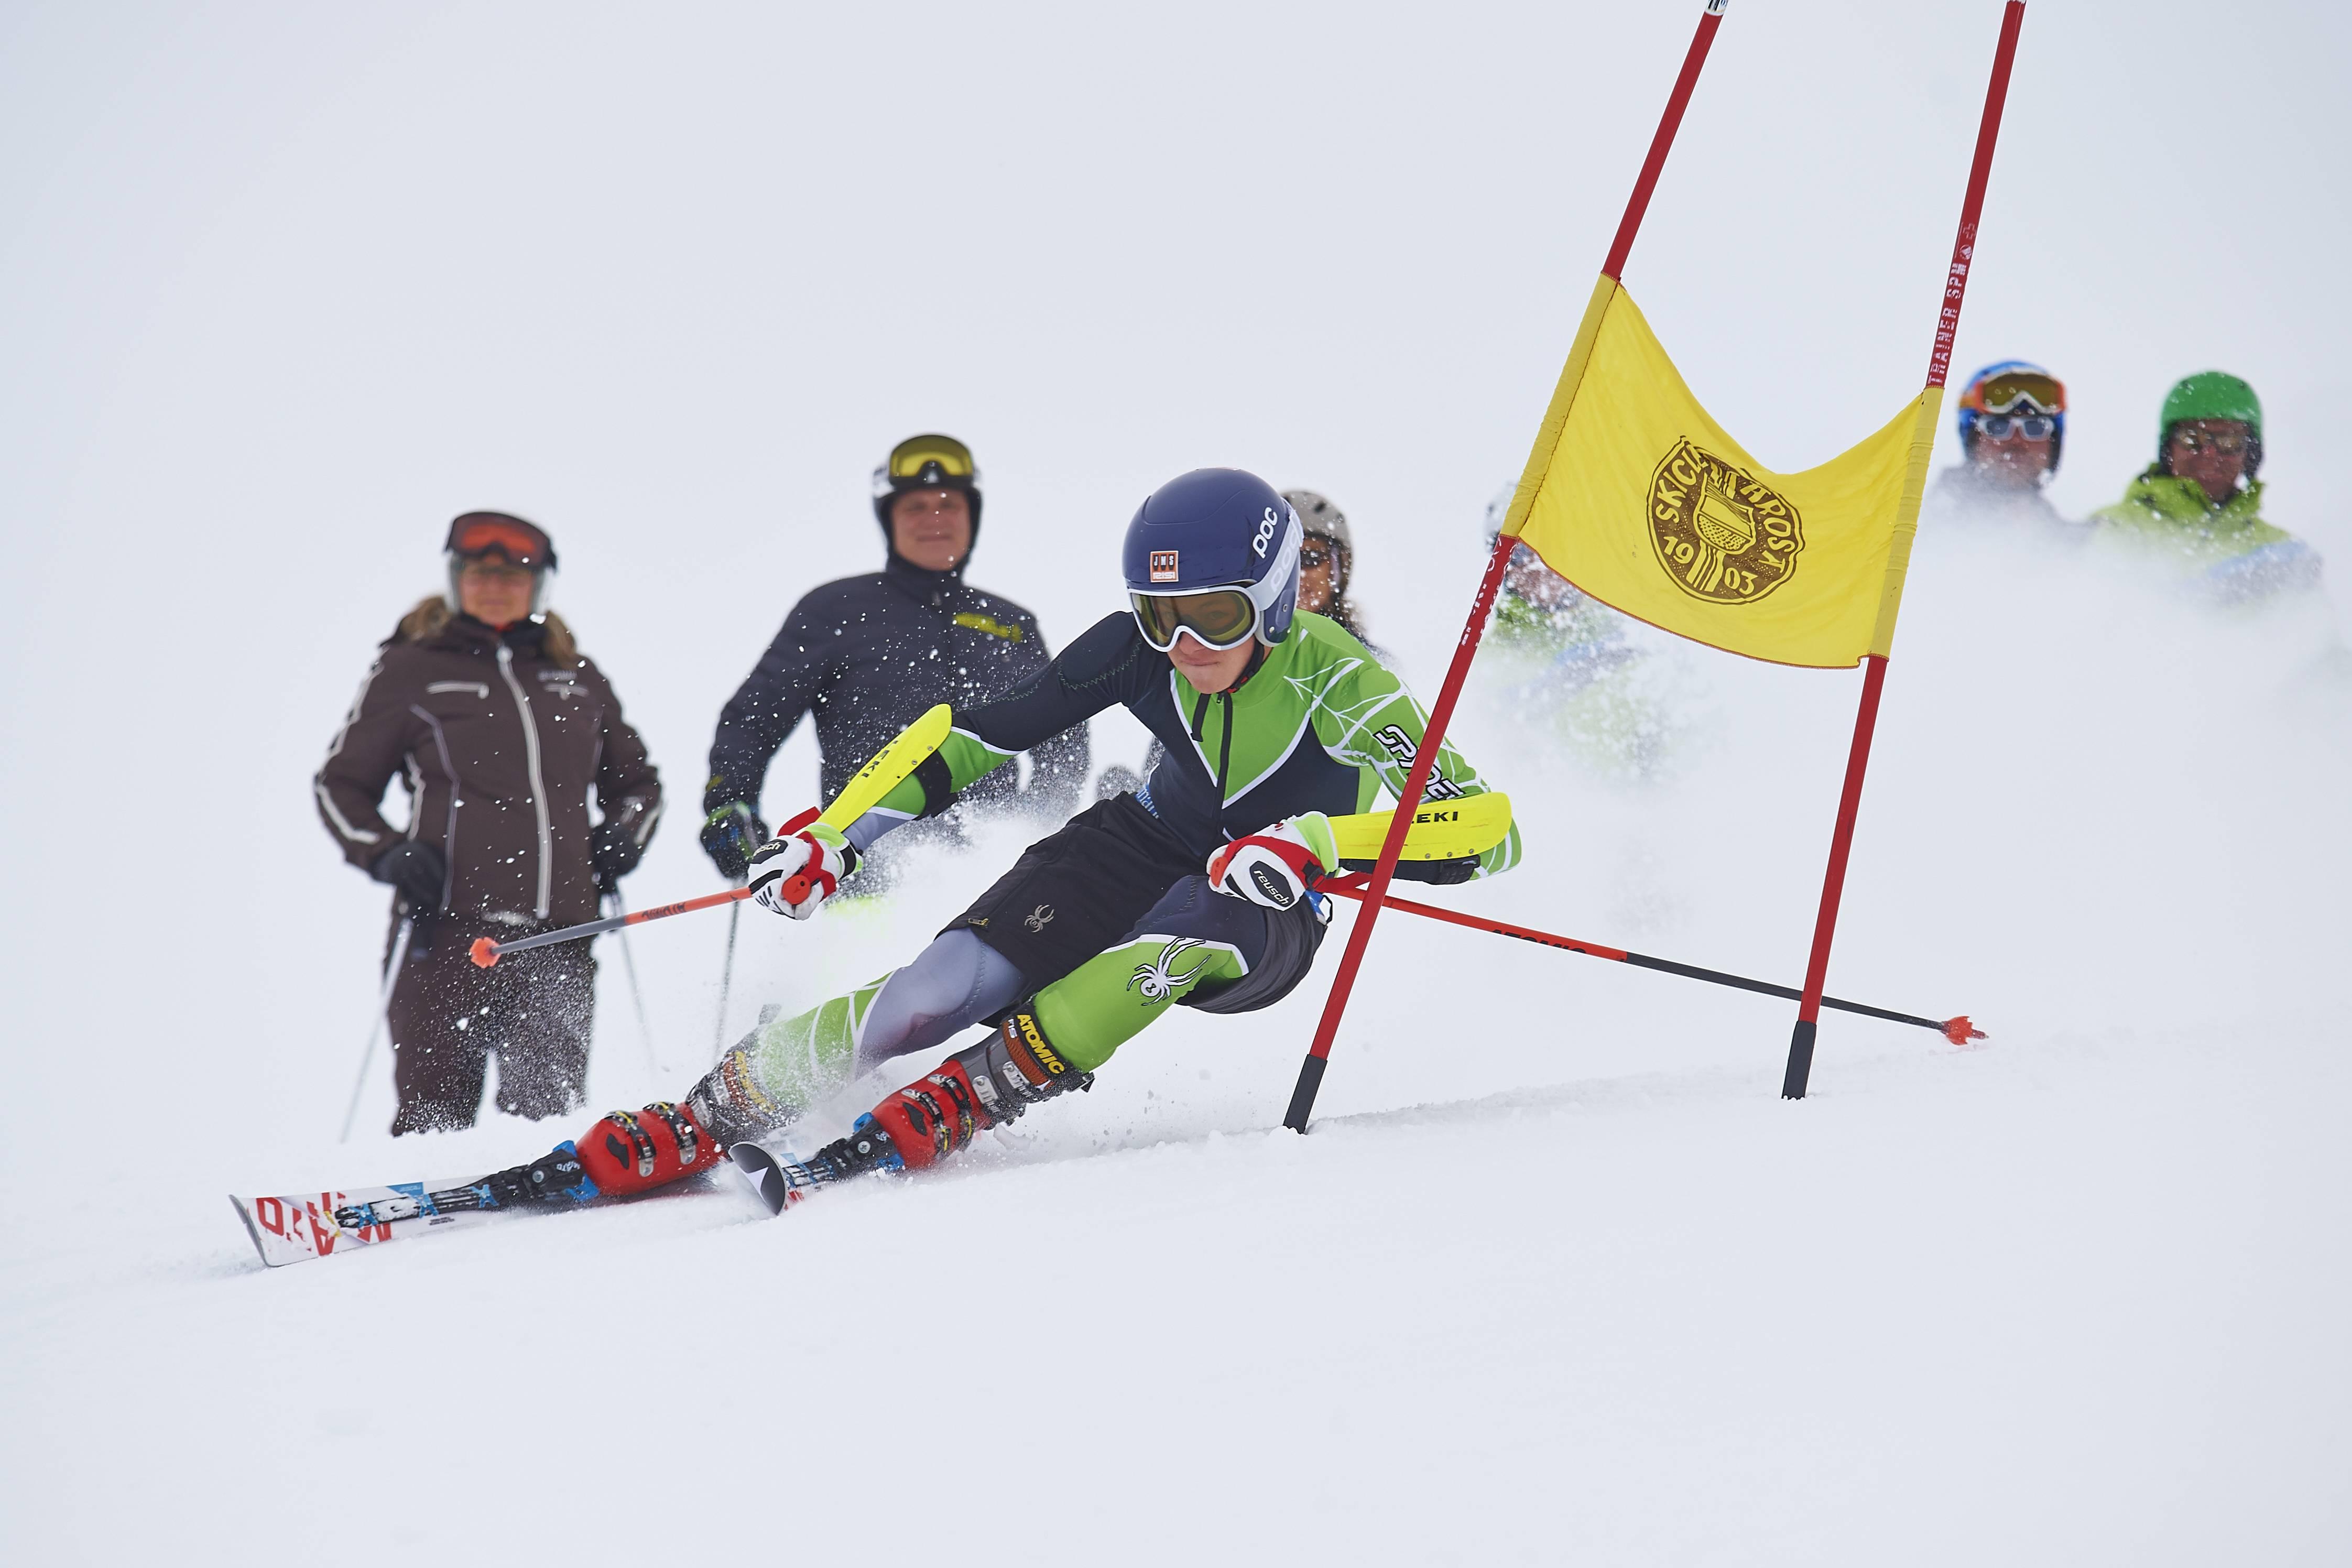 Skiclub Arosa